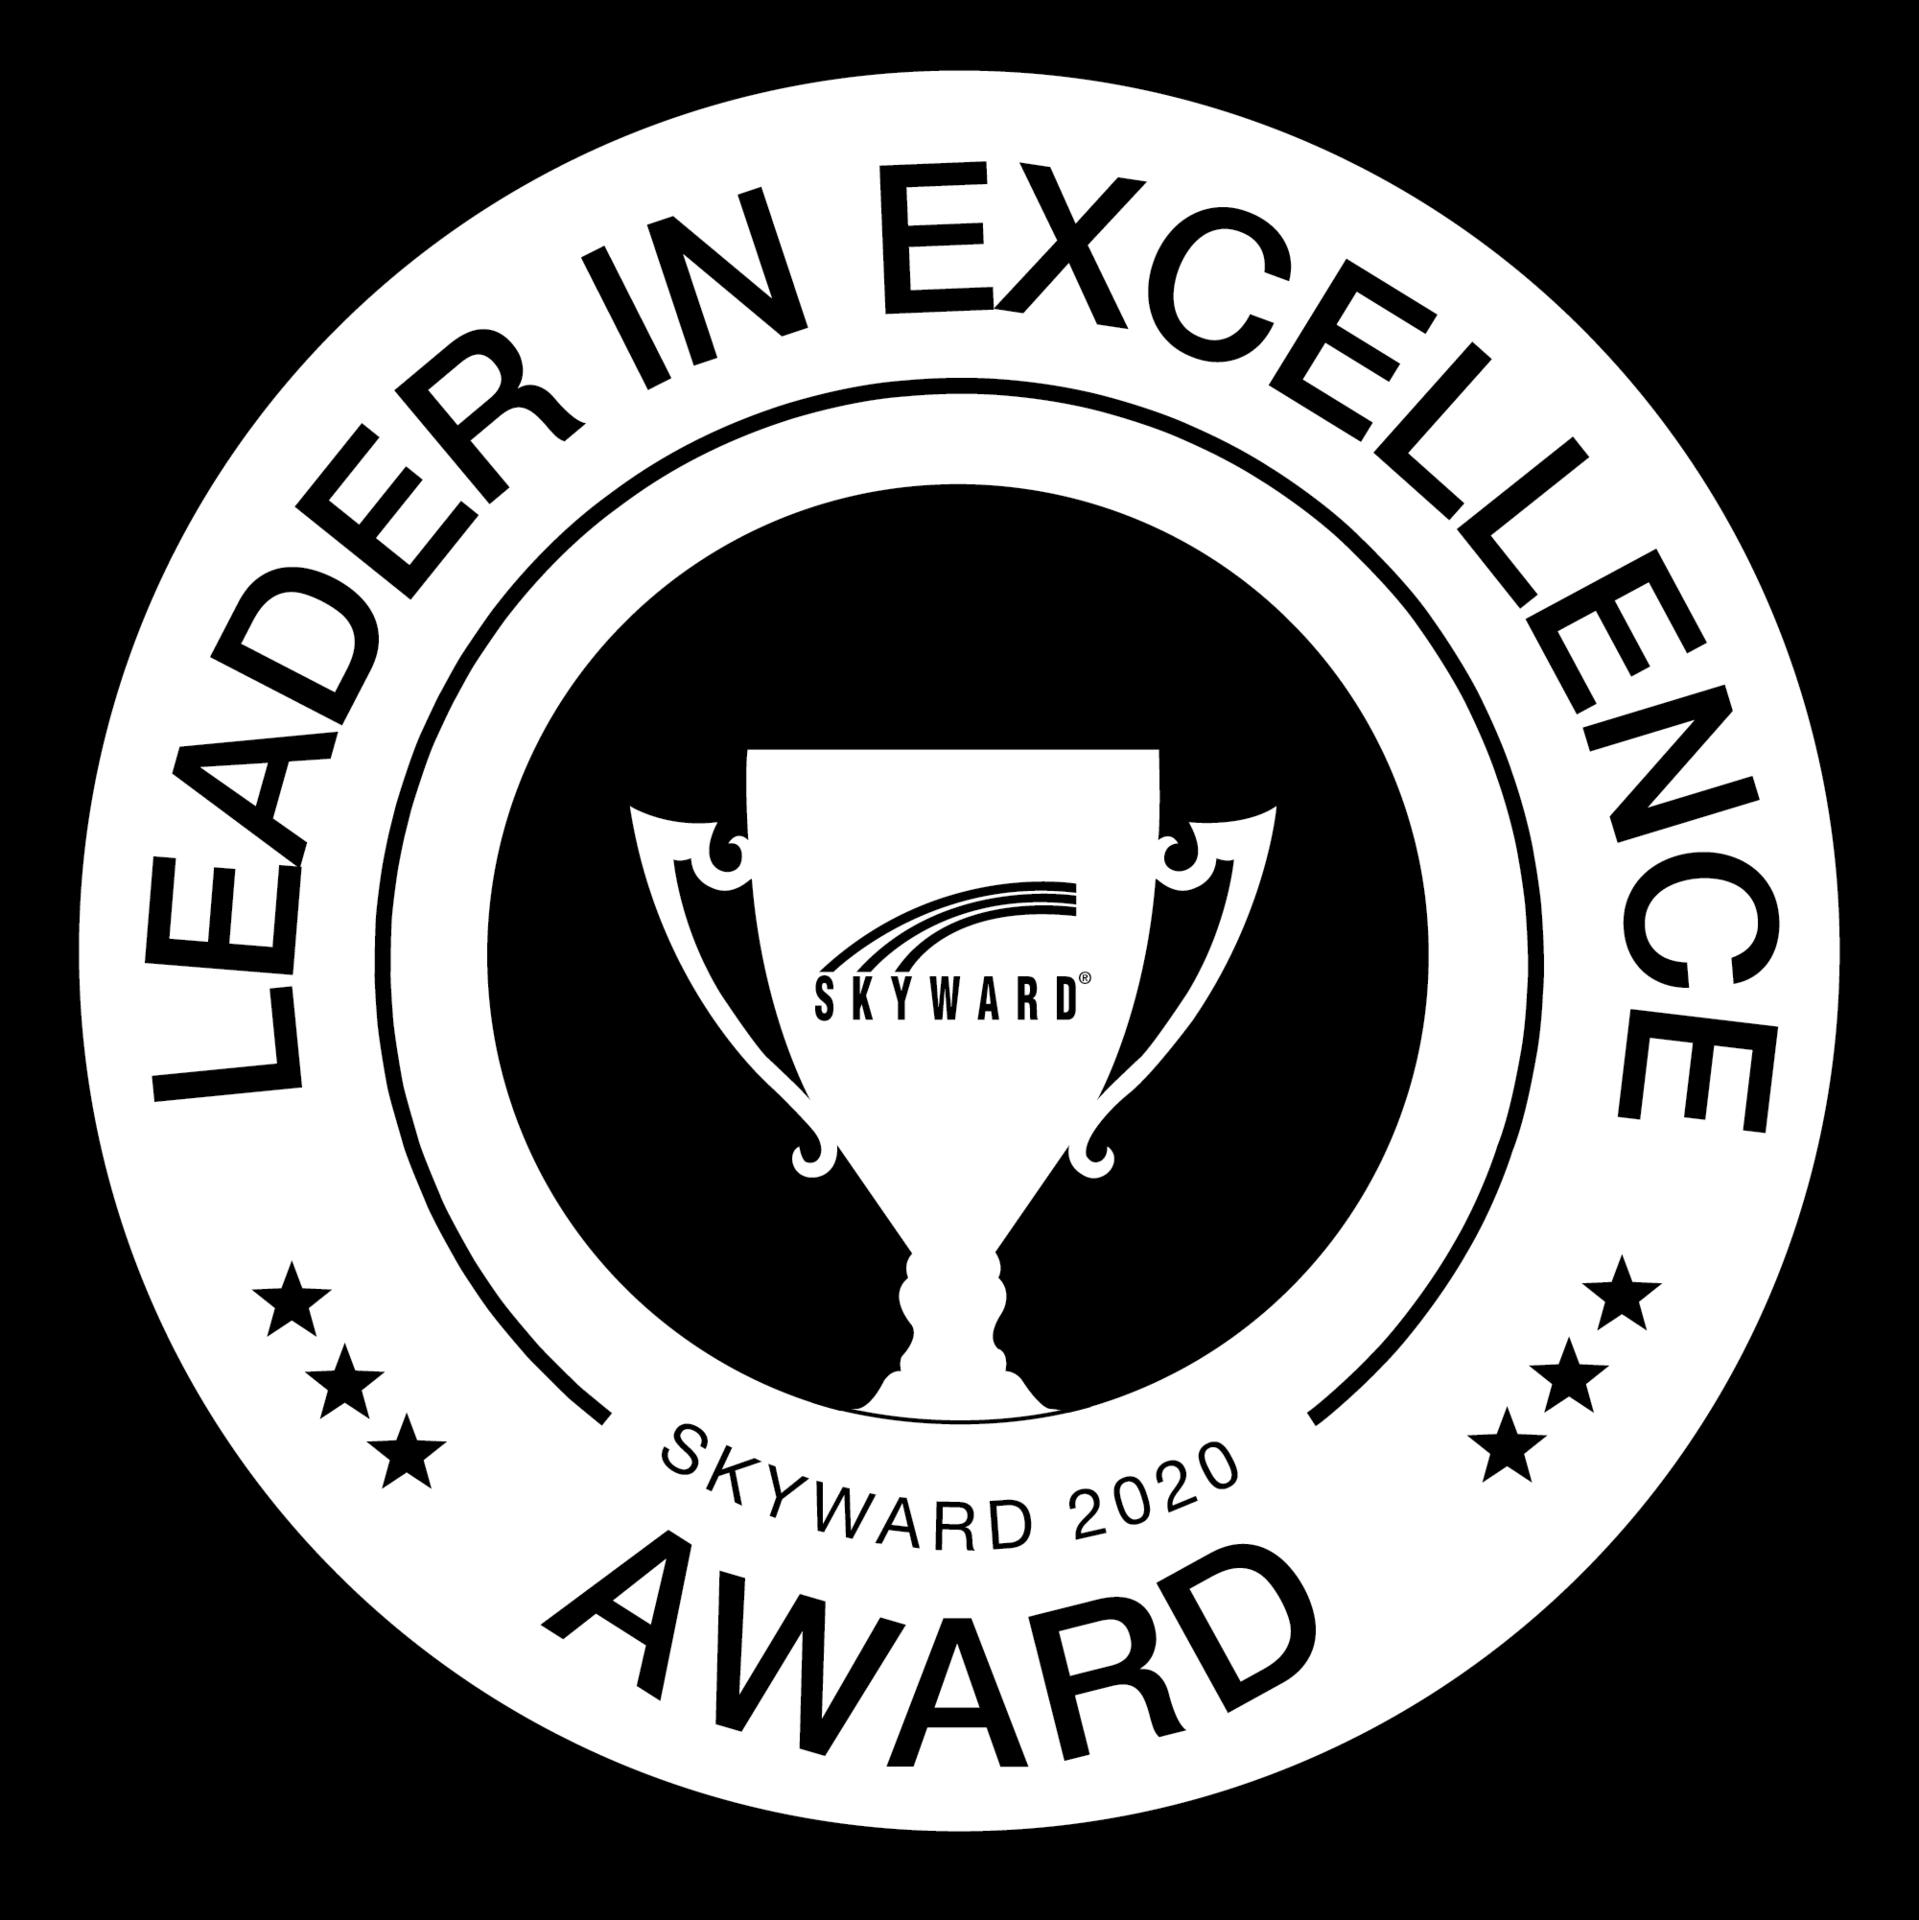 leader in excellence award logo